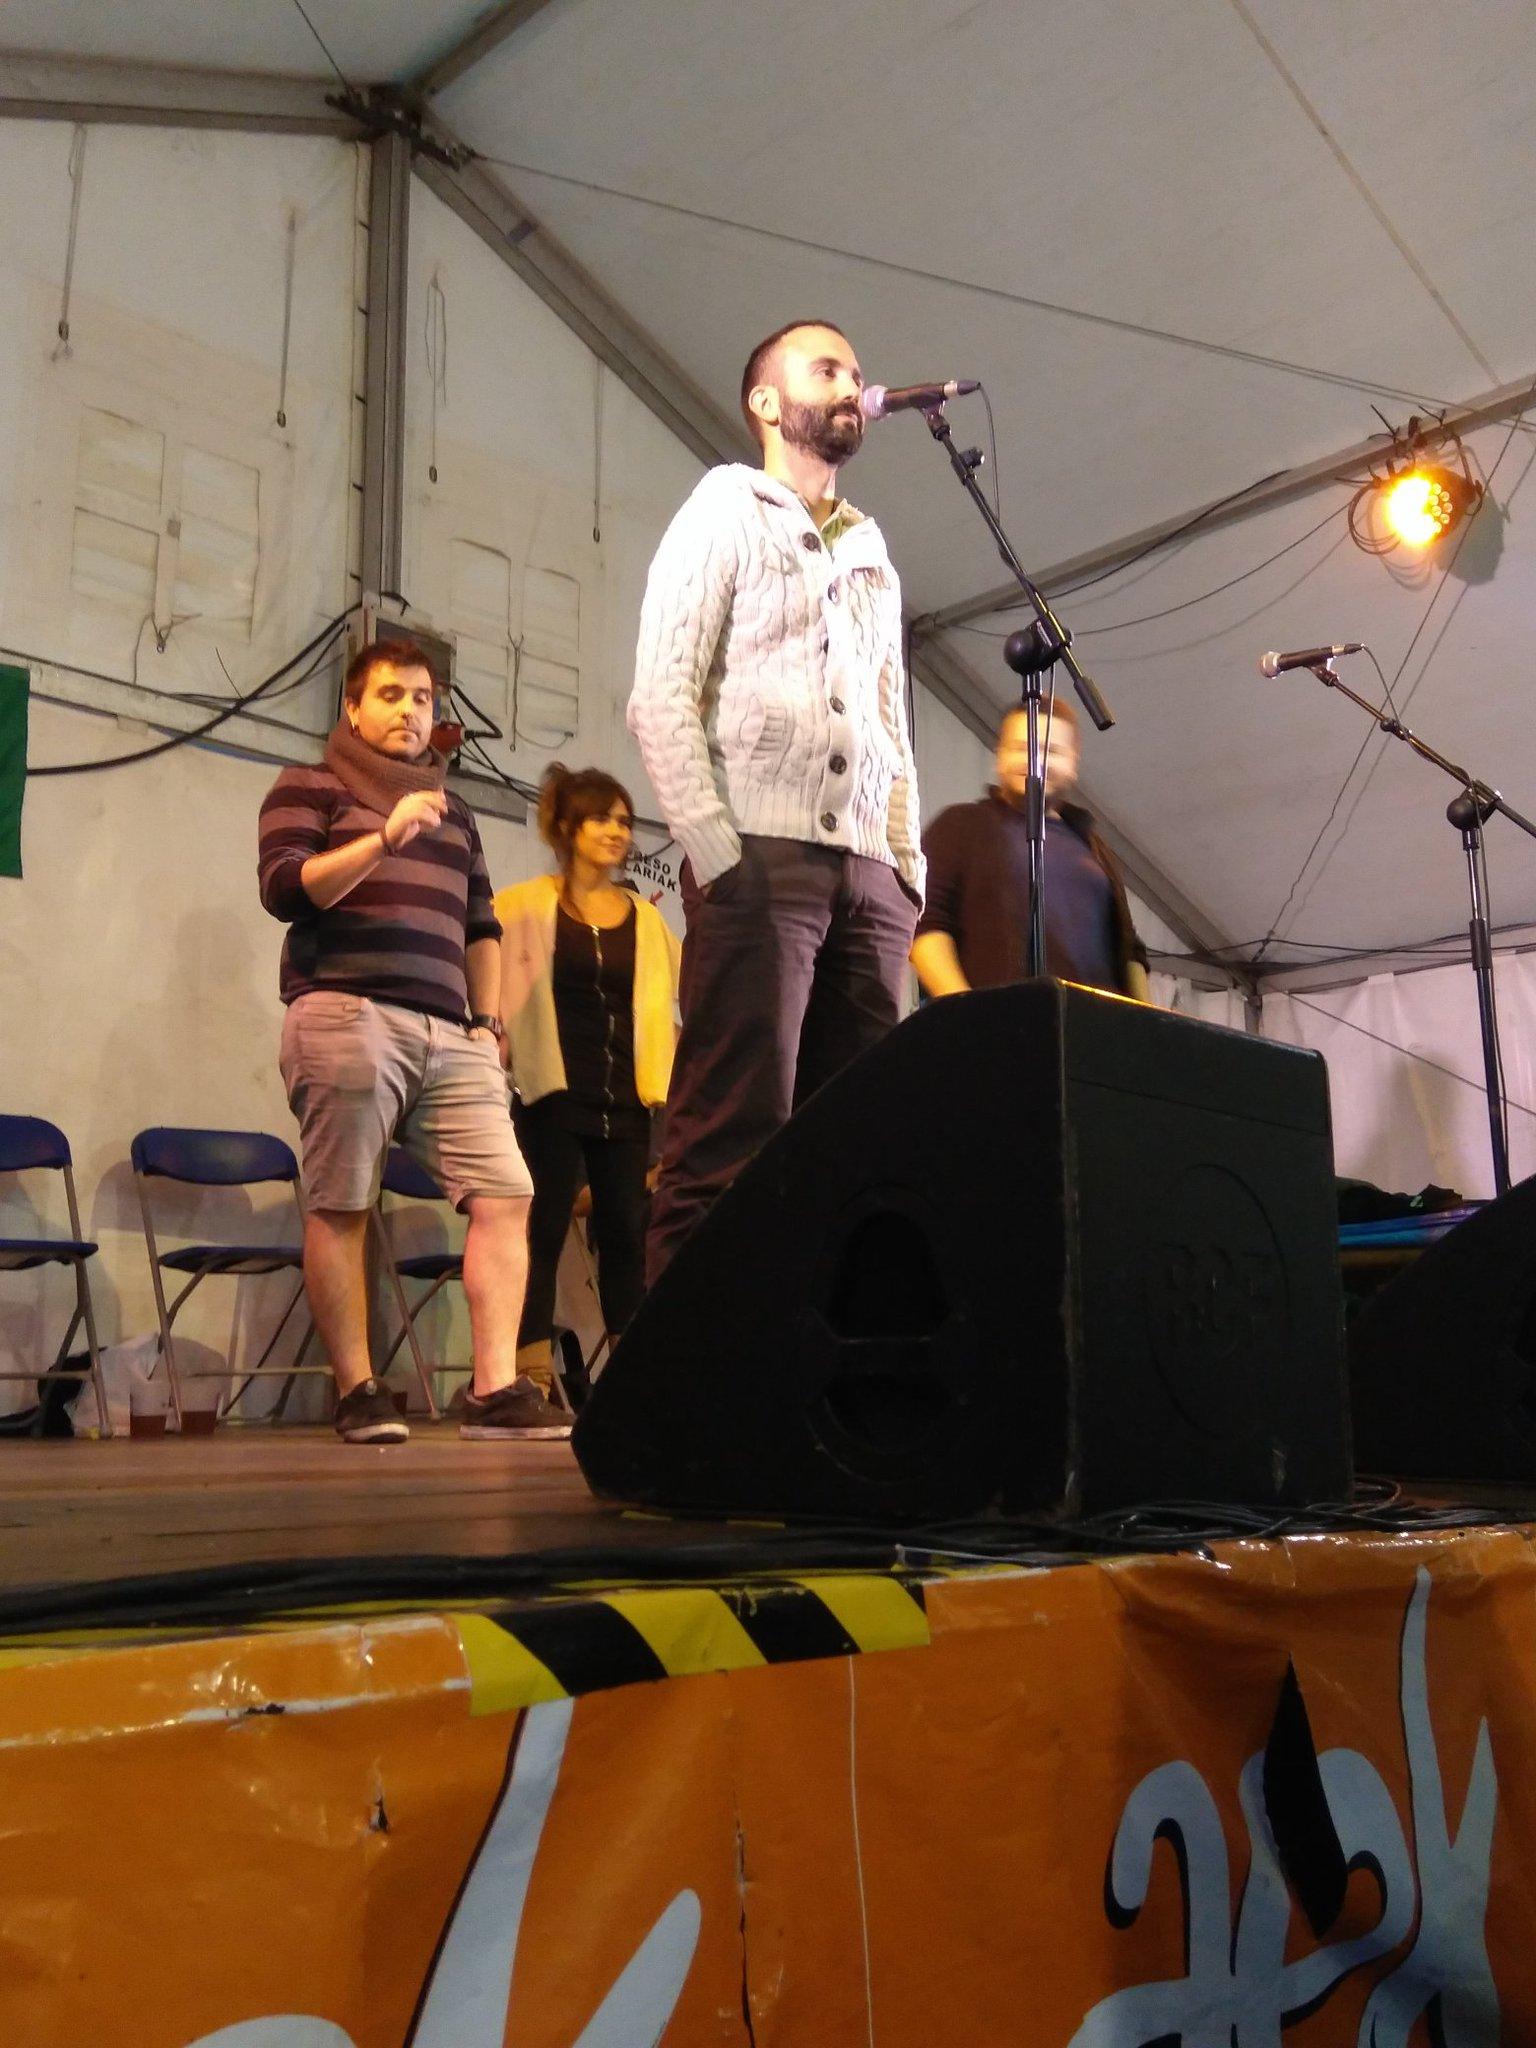 Bertso saio musikatua #euskalgunea #madalenak2017 https://t.co/vGhfHVUhXJ